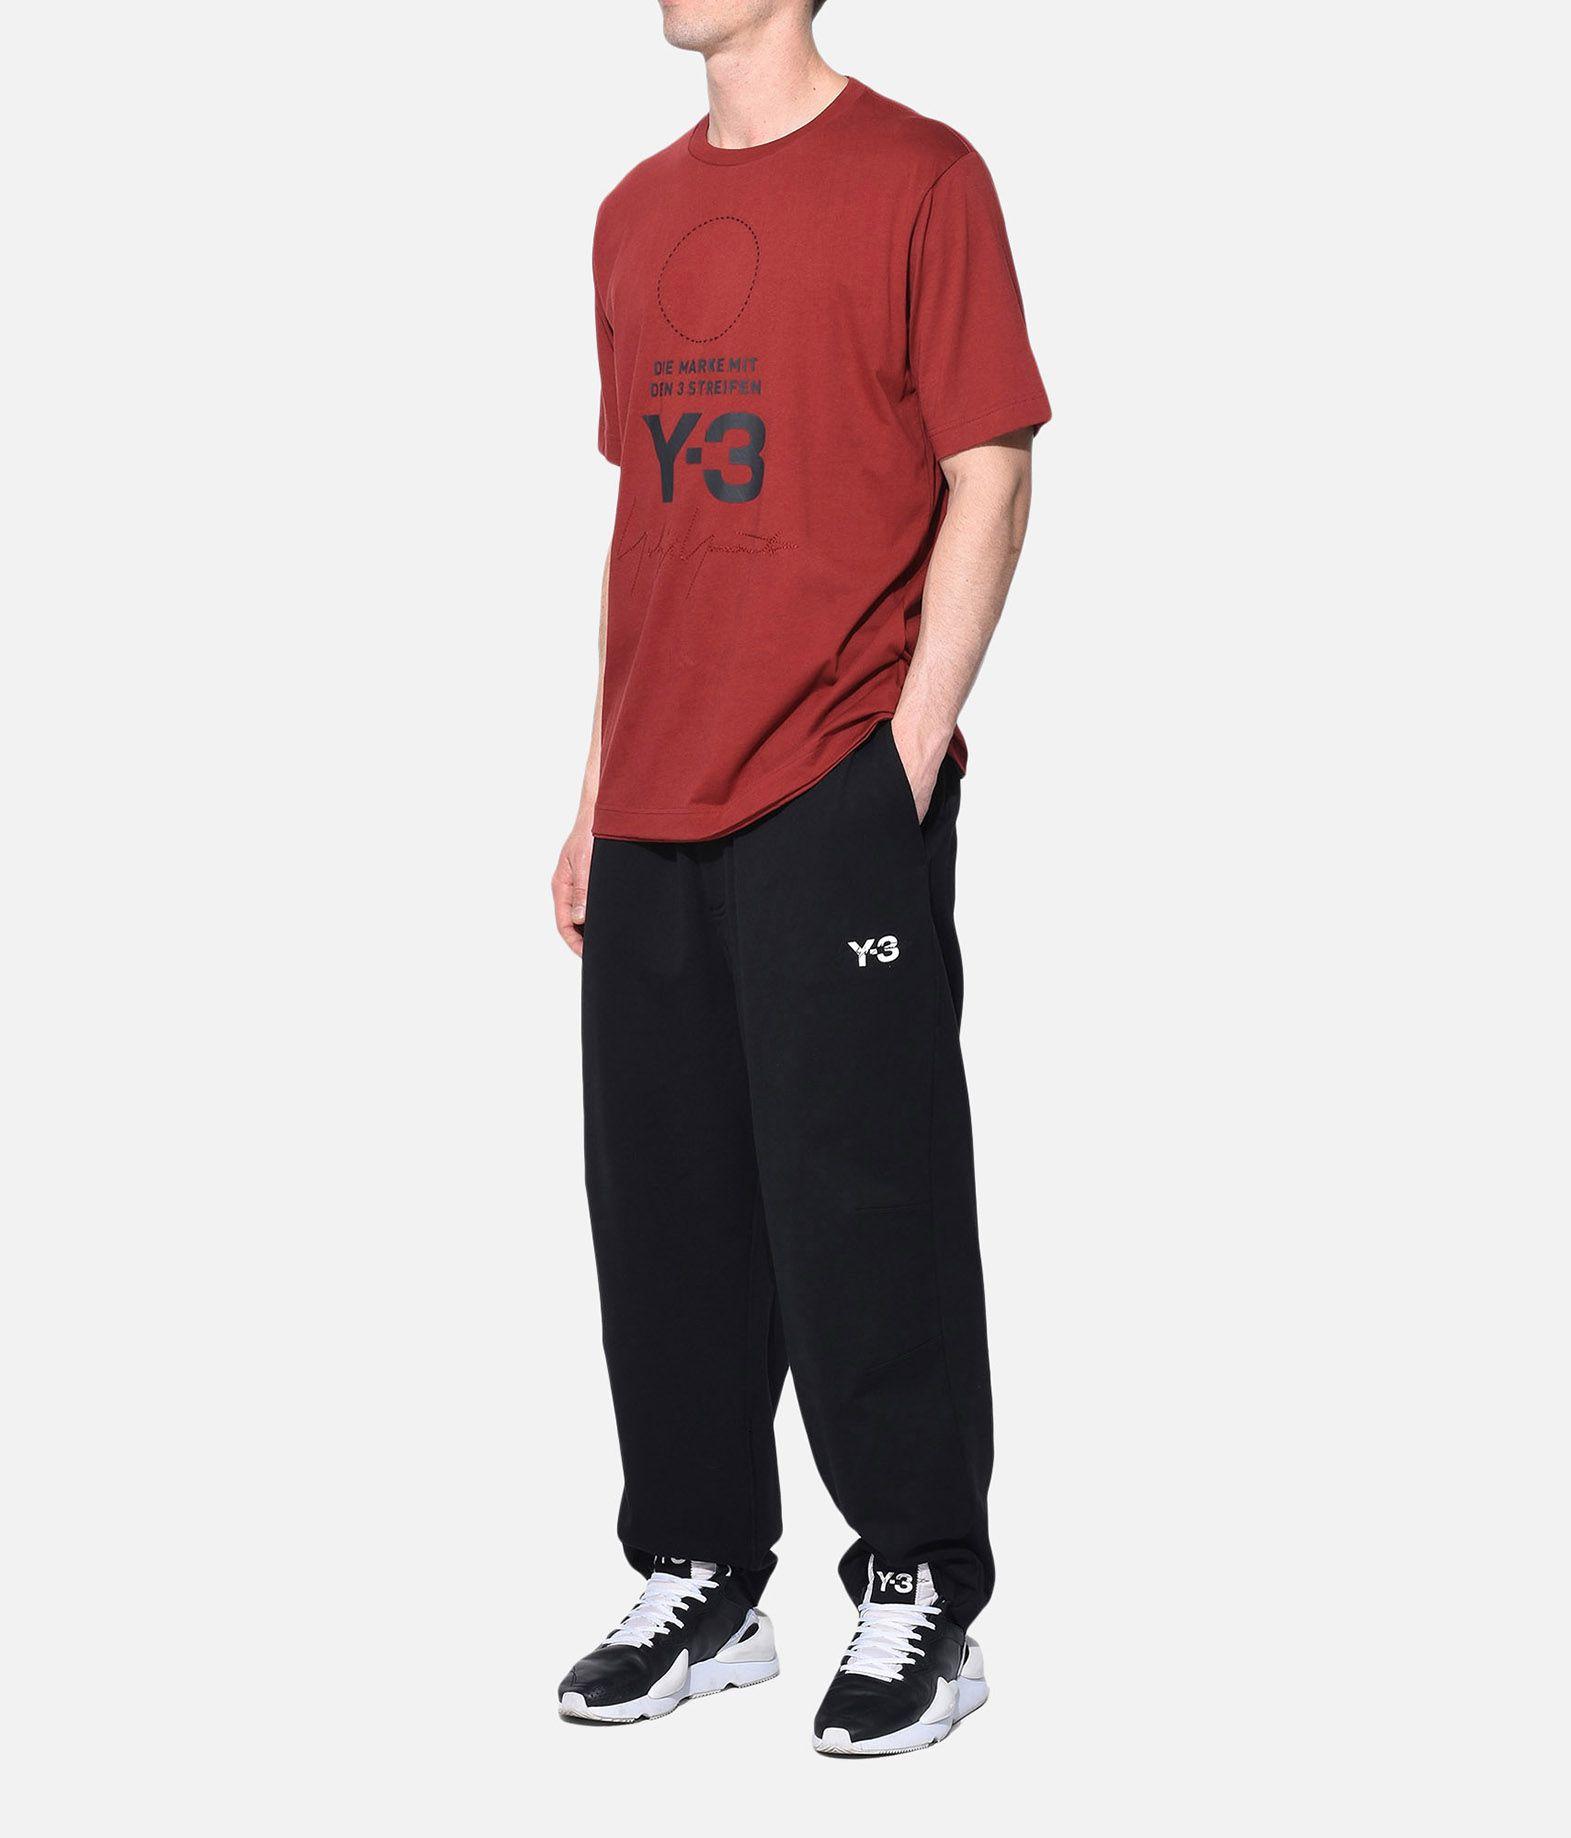 Y-3 Y-3 Stacked Logo Tee T-shirt maniche corte Uomo a